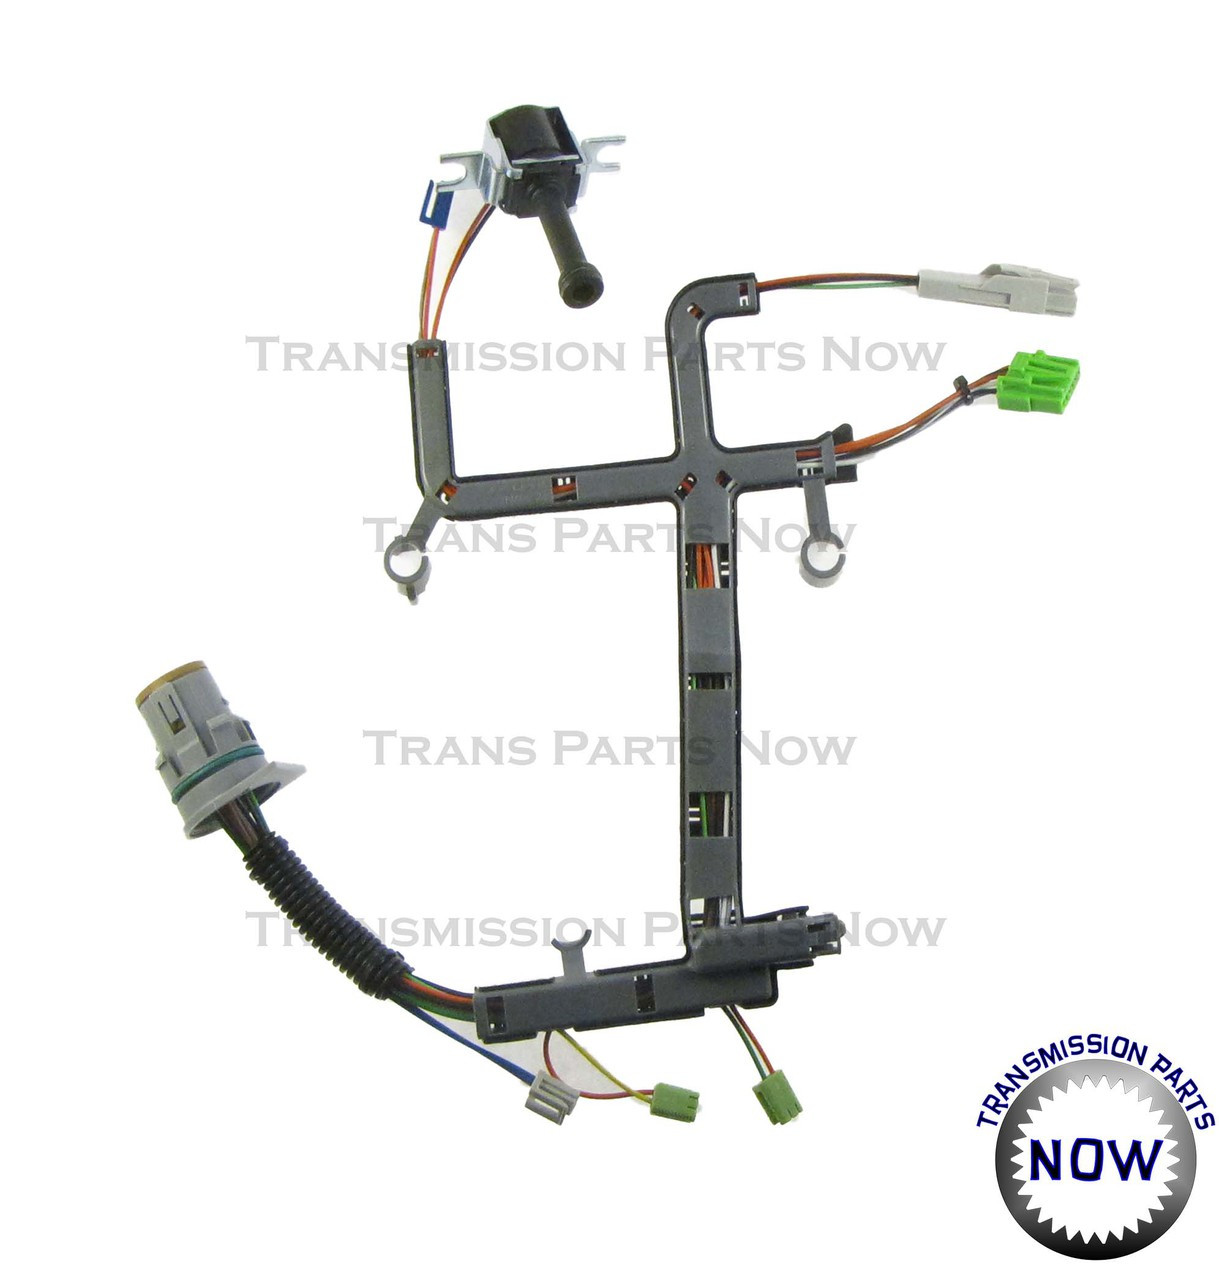 medium resolution of rostra 350 0152 4l65e 4l70e 2009 2012 wiring harness wire loom 2009 2012 internal transmission wiring